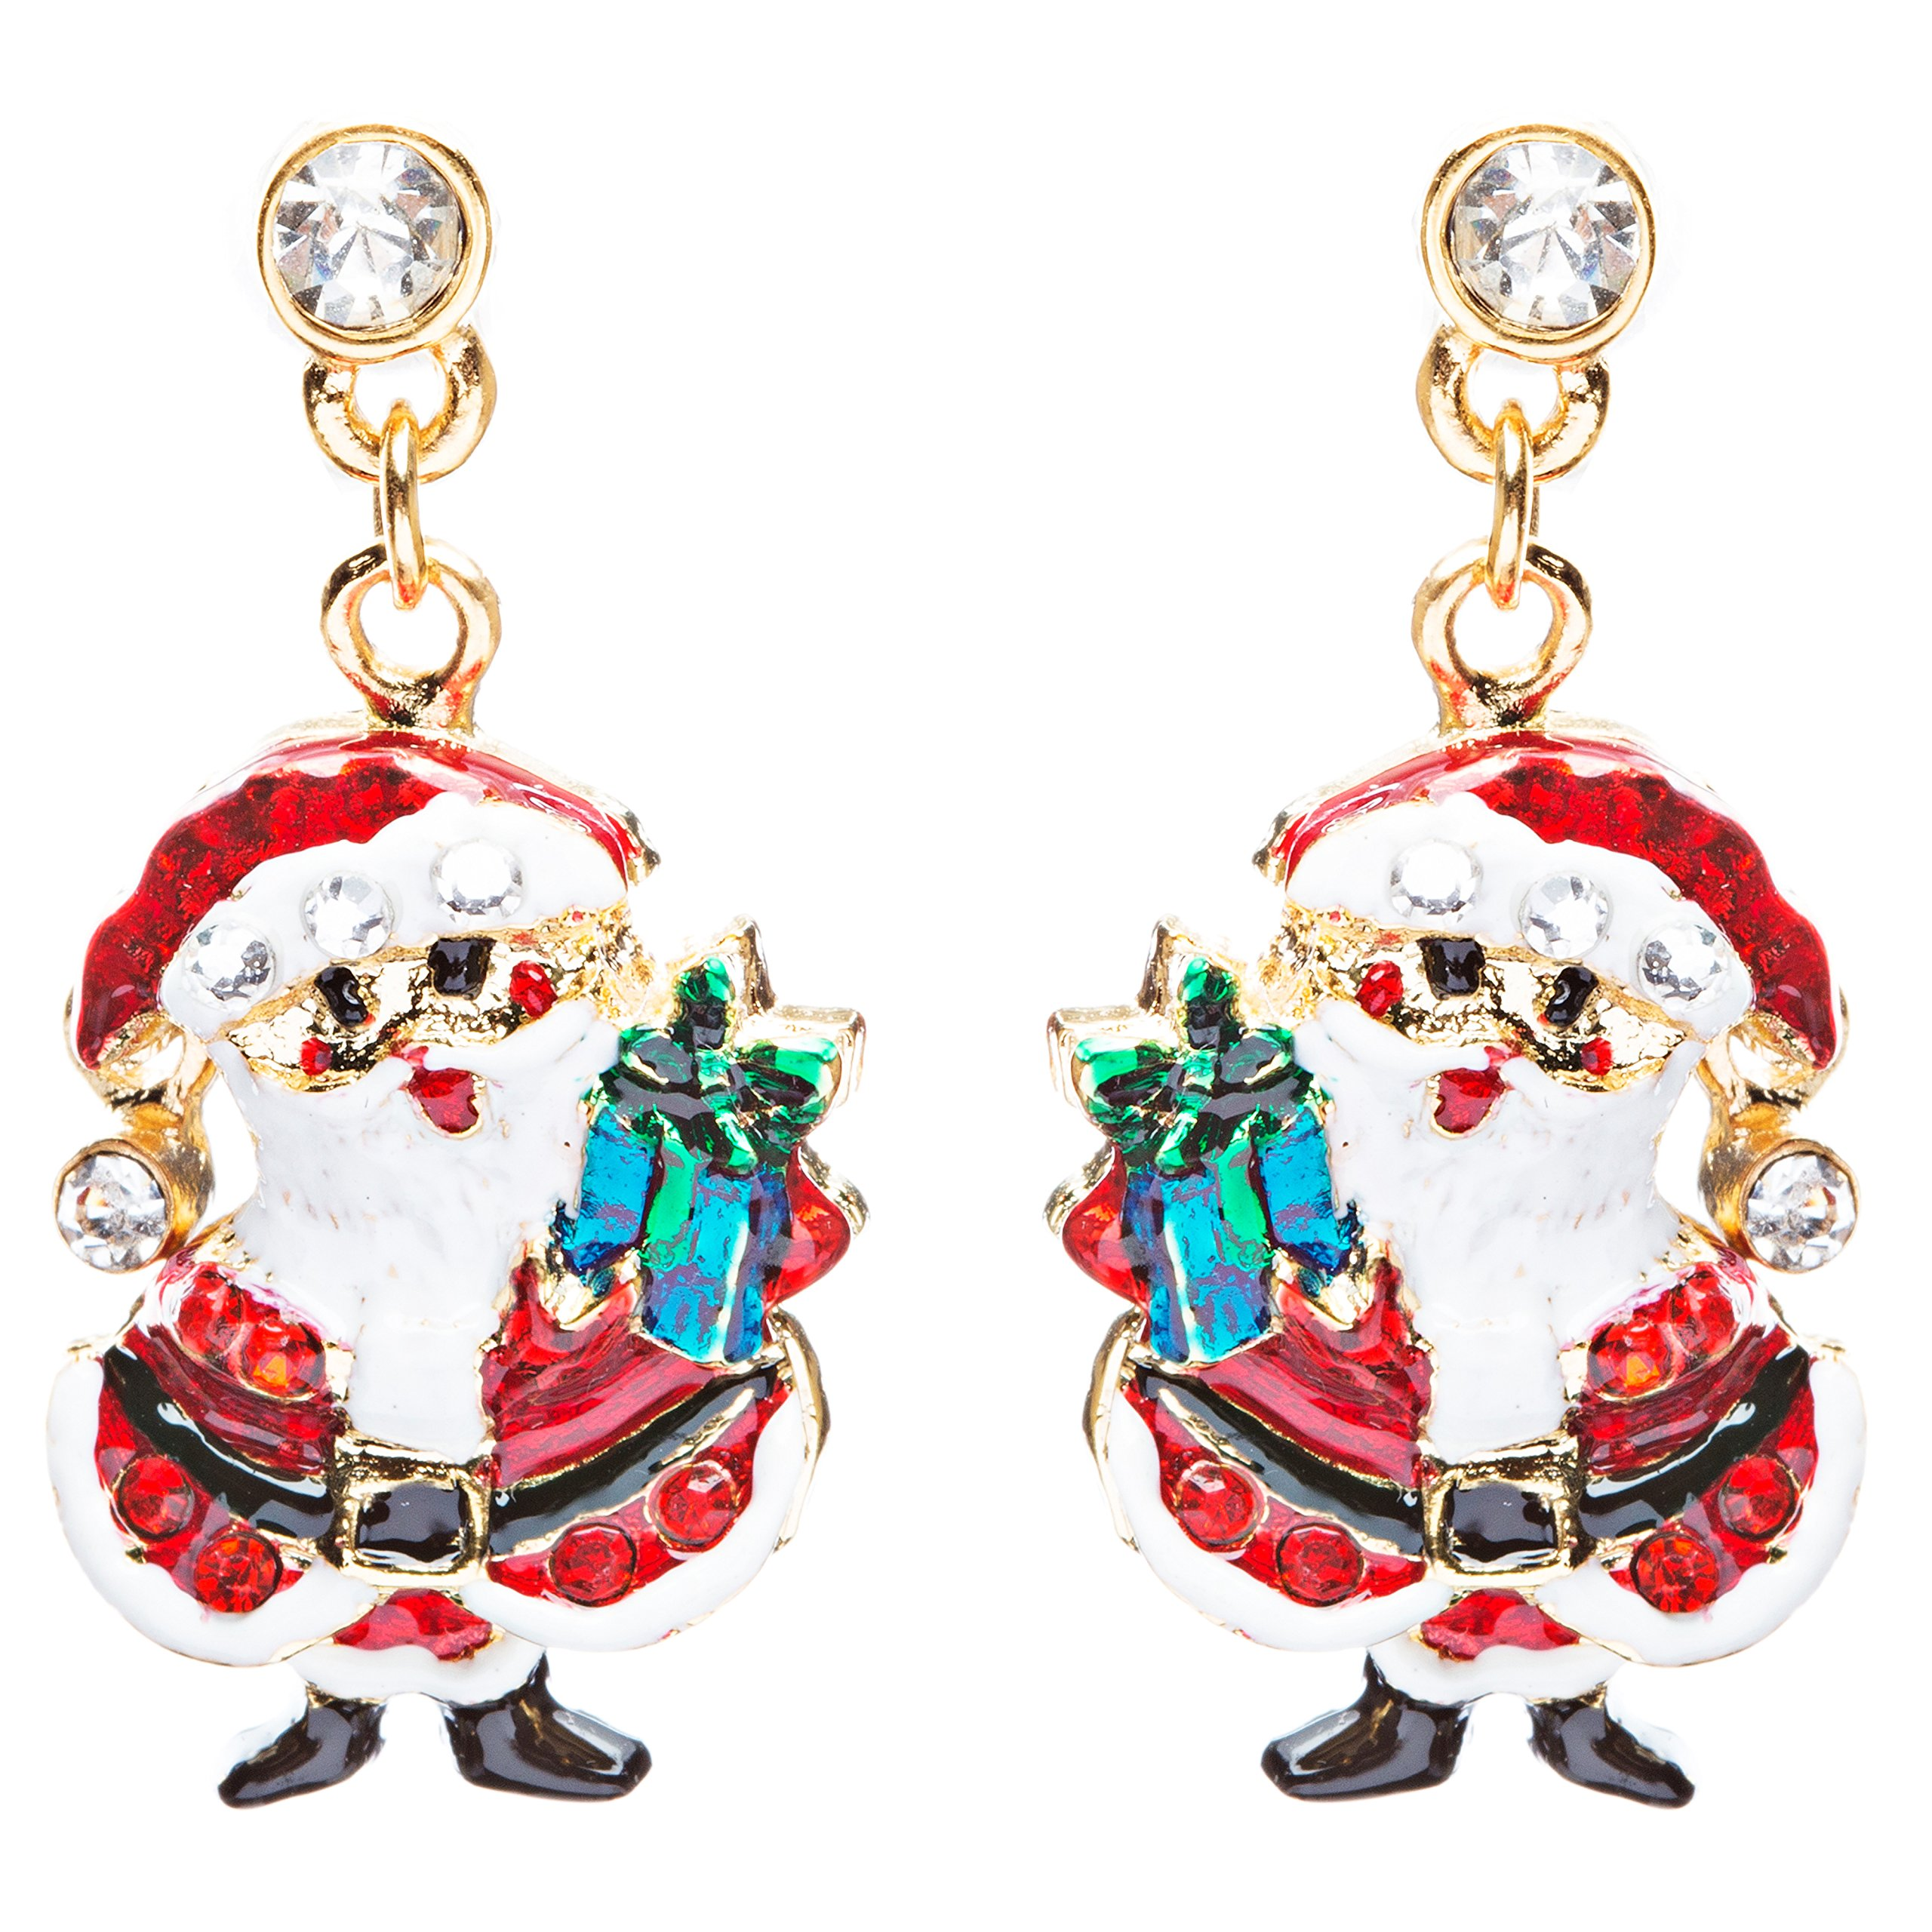 ACCESSORIESFOREVER Women Christmas Jewelry Crystal Rhinestone Santa Claus Present Dangle Earrings E877